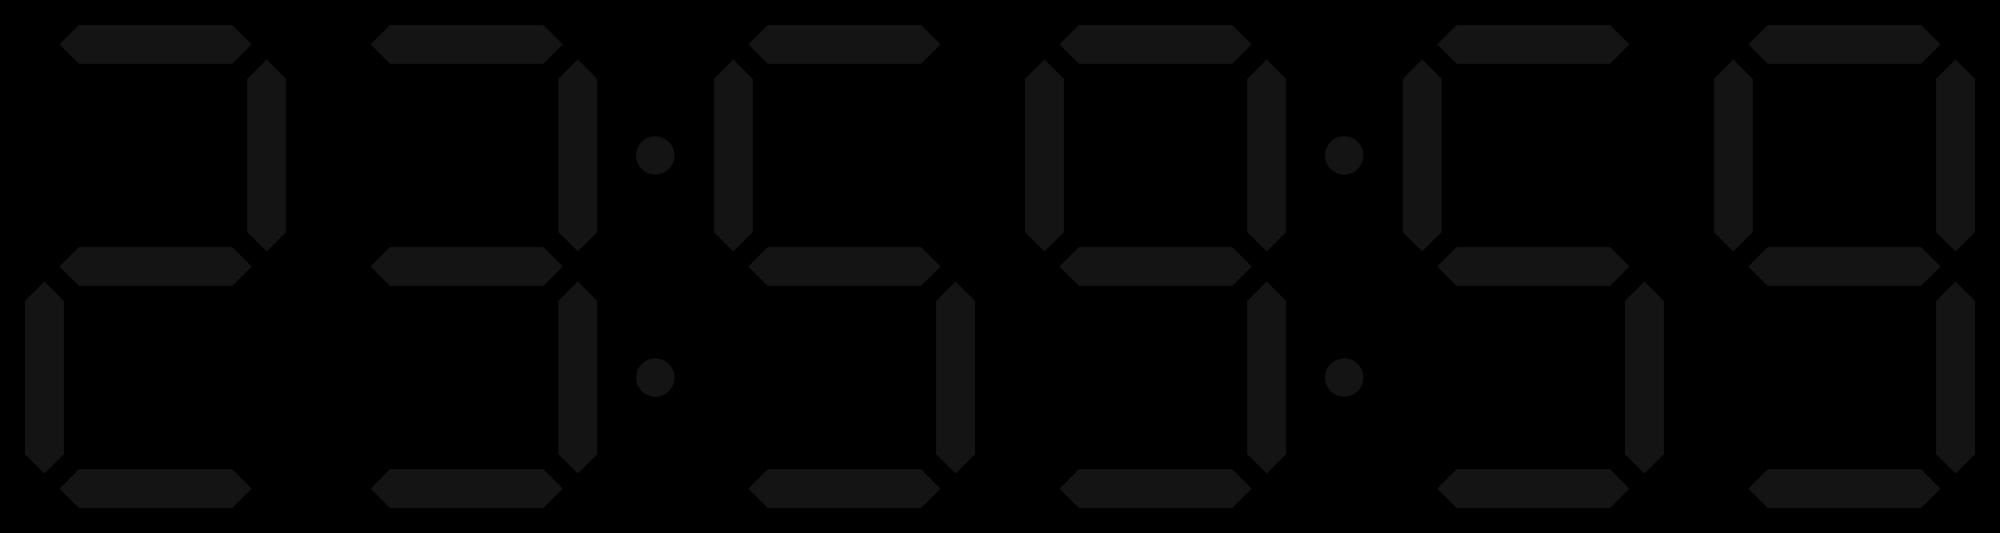 See clipart digital watch. File clock display svg